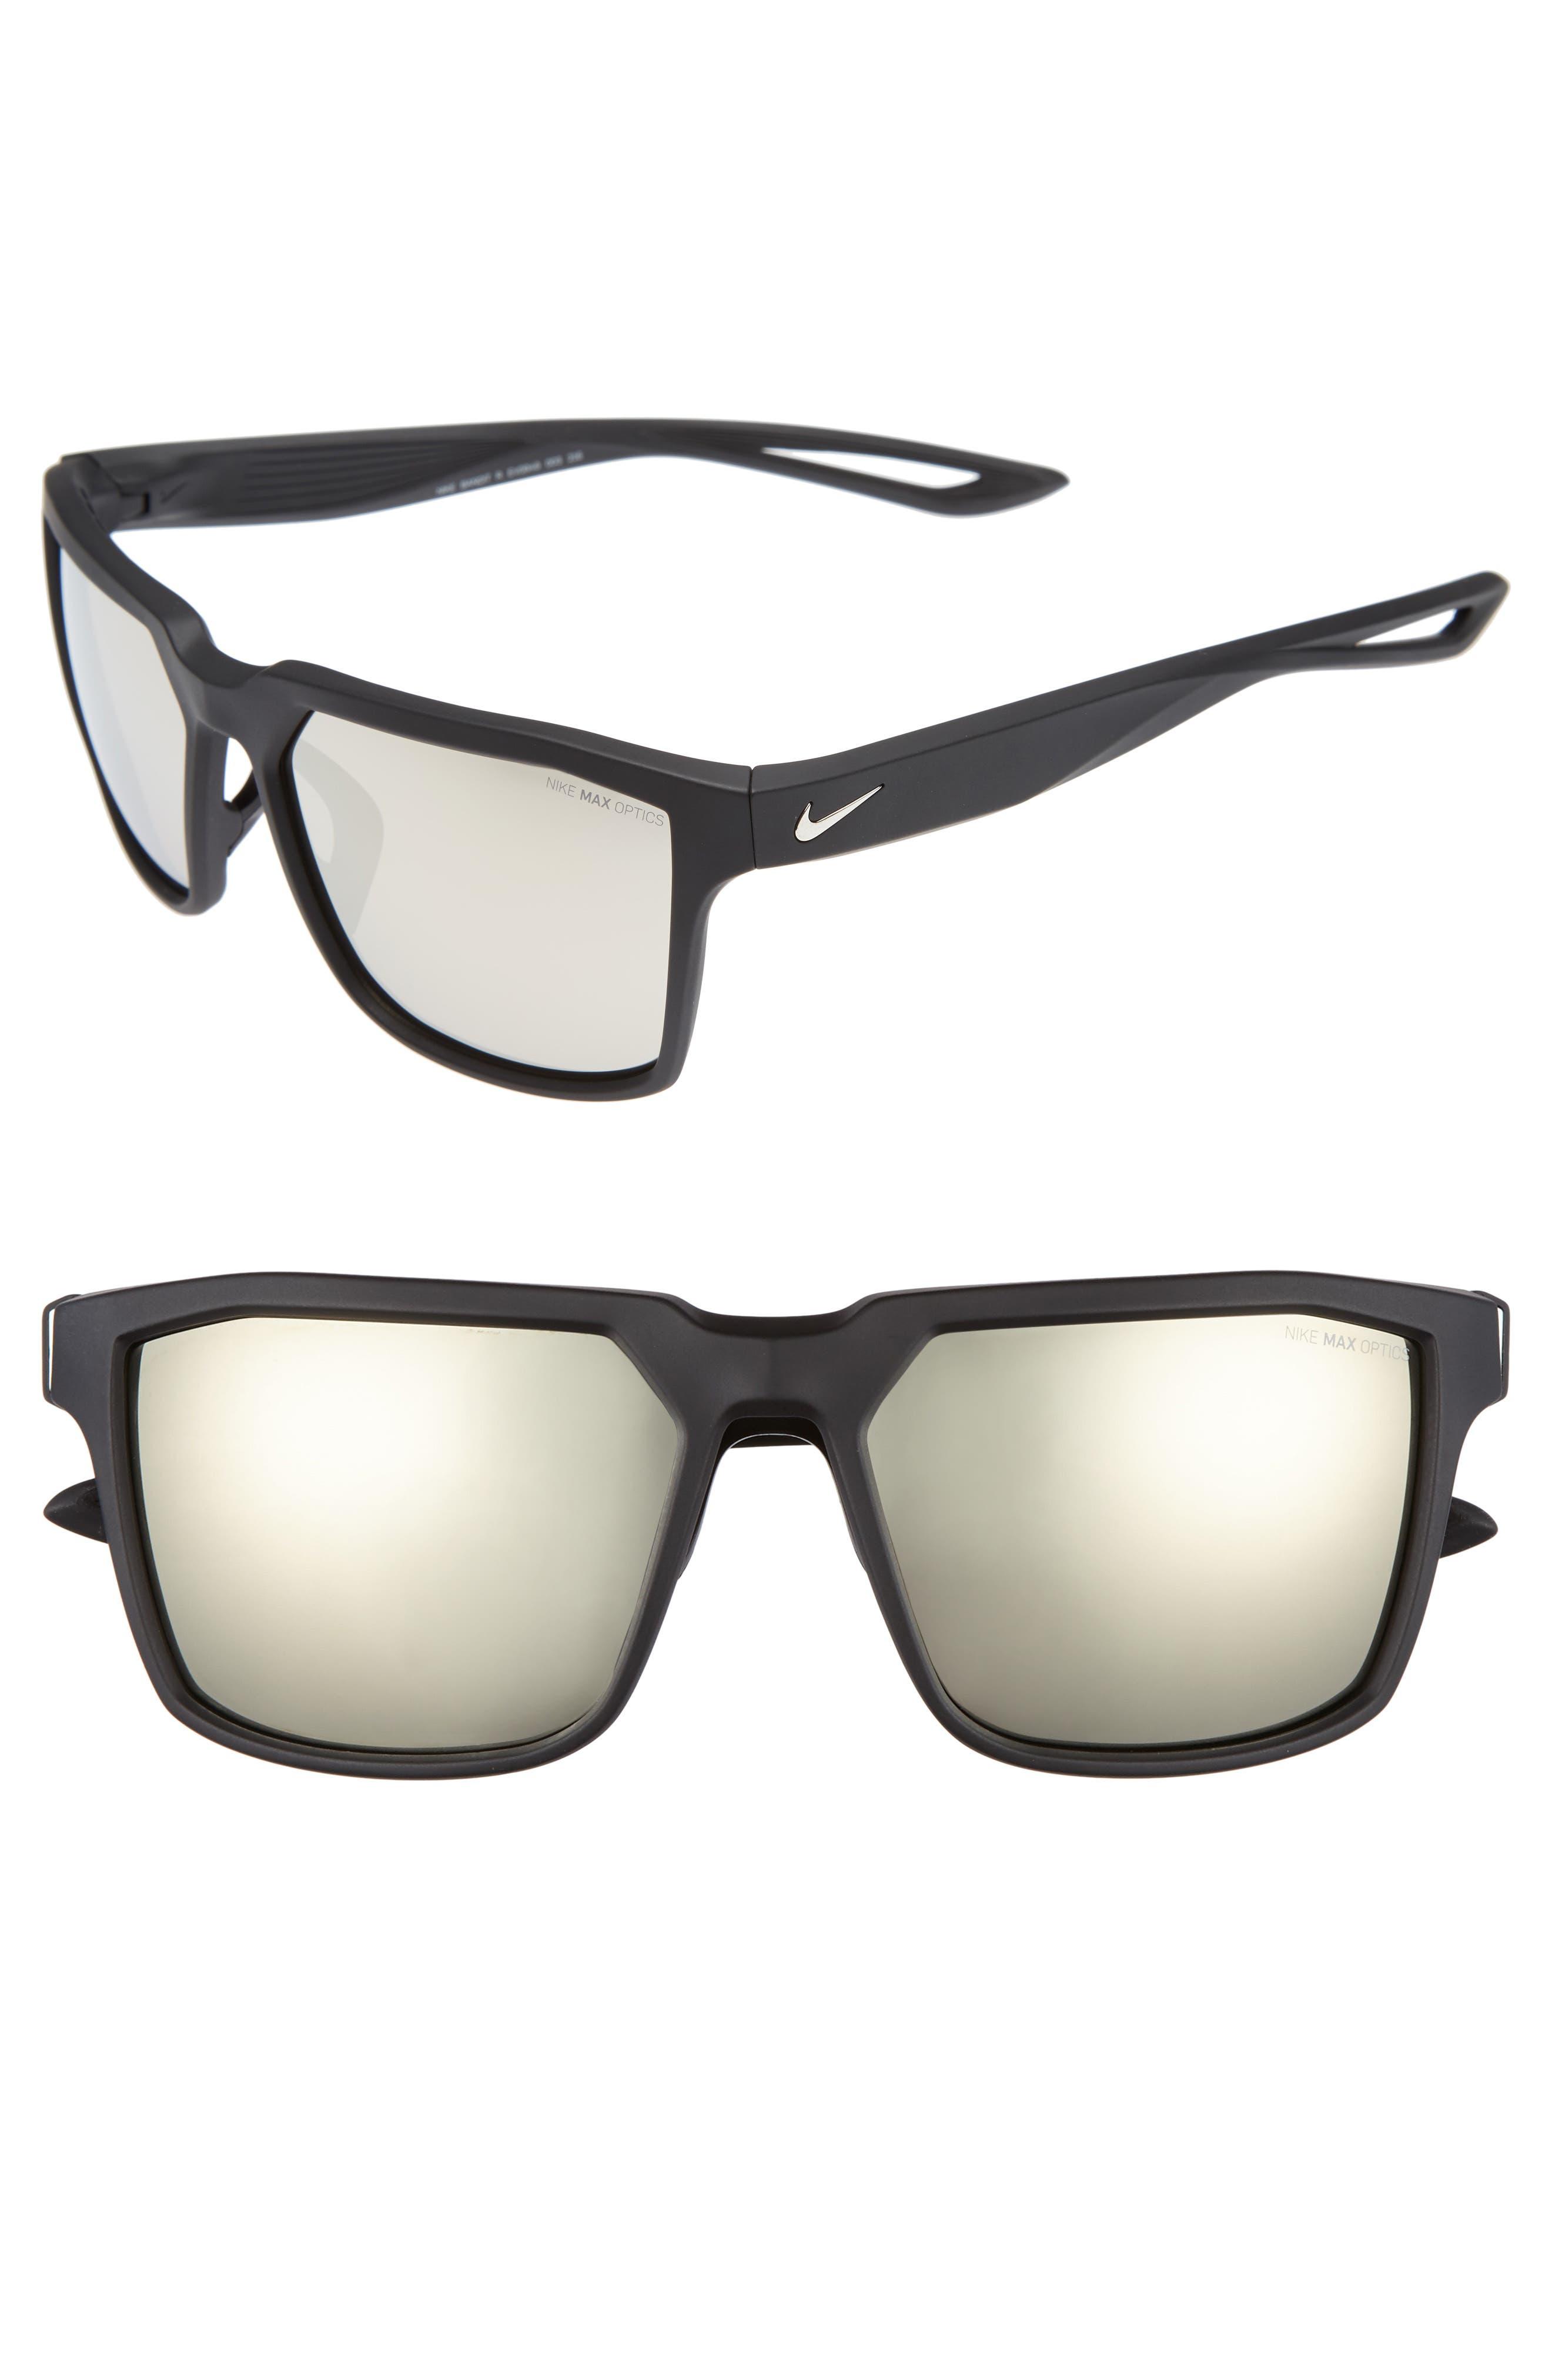 NIKE Bandit R 59mm Sunglasses, Main, color, MATTE BLACK/ SILVER